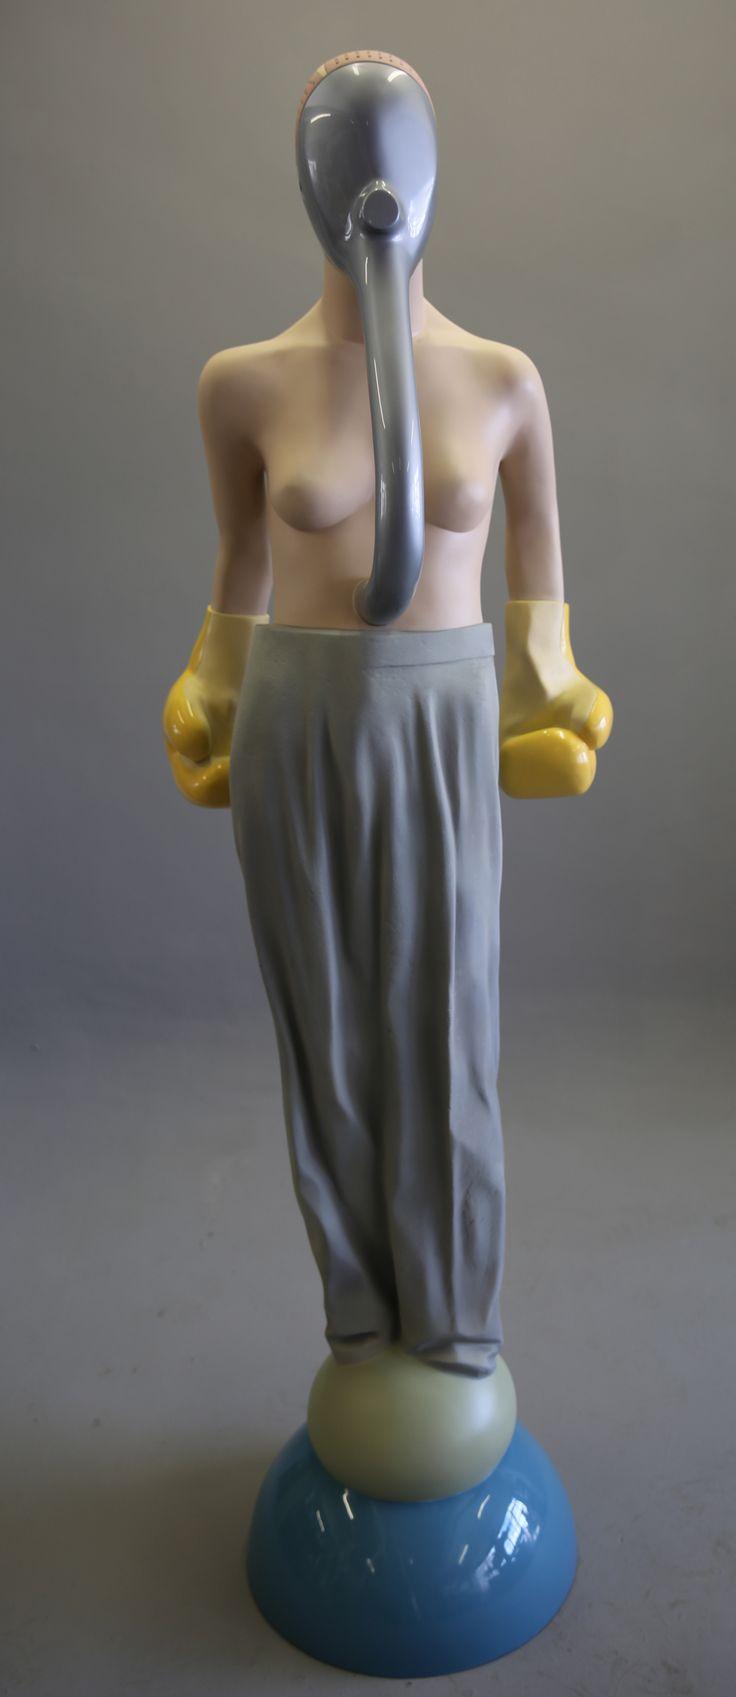 Stefa Blom | 'Brynhildr' DShK exhibition | Zeitz Museum of Contemporary Art Africa Permanent Collection